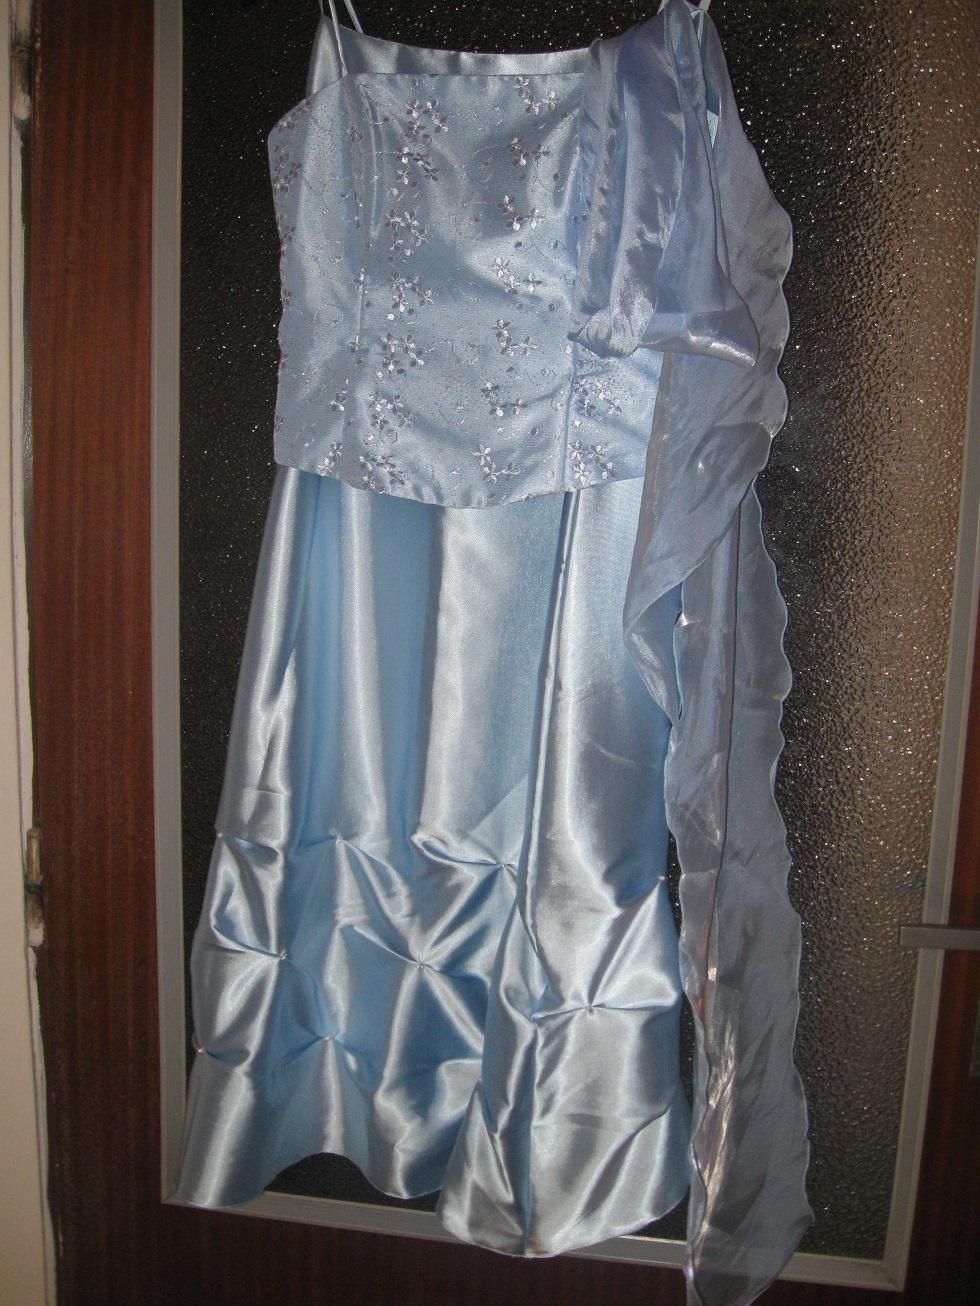 540c10fa84b2 Spoločenské šaty korzetové cena s poštovným